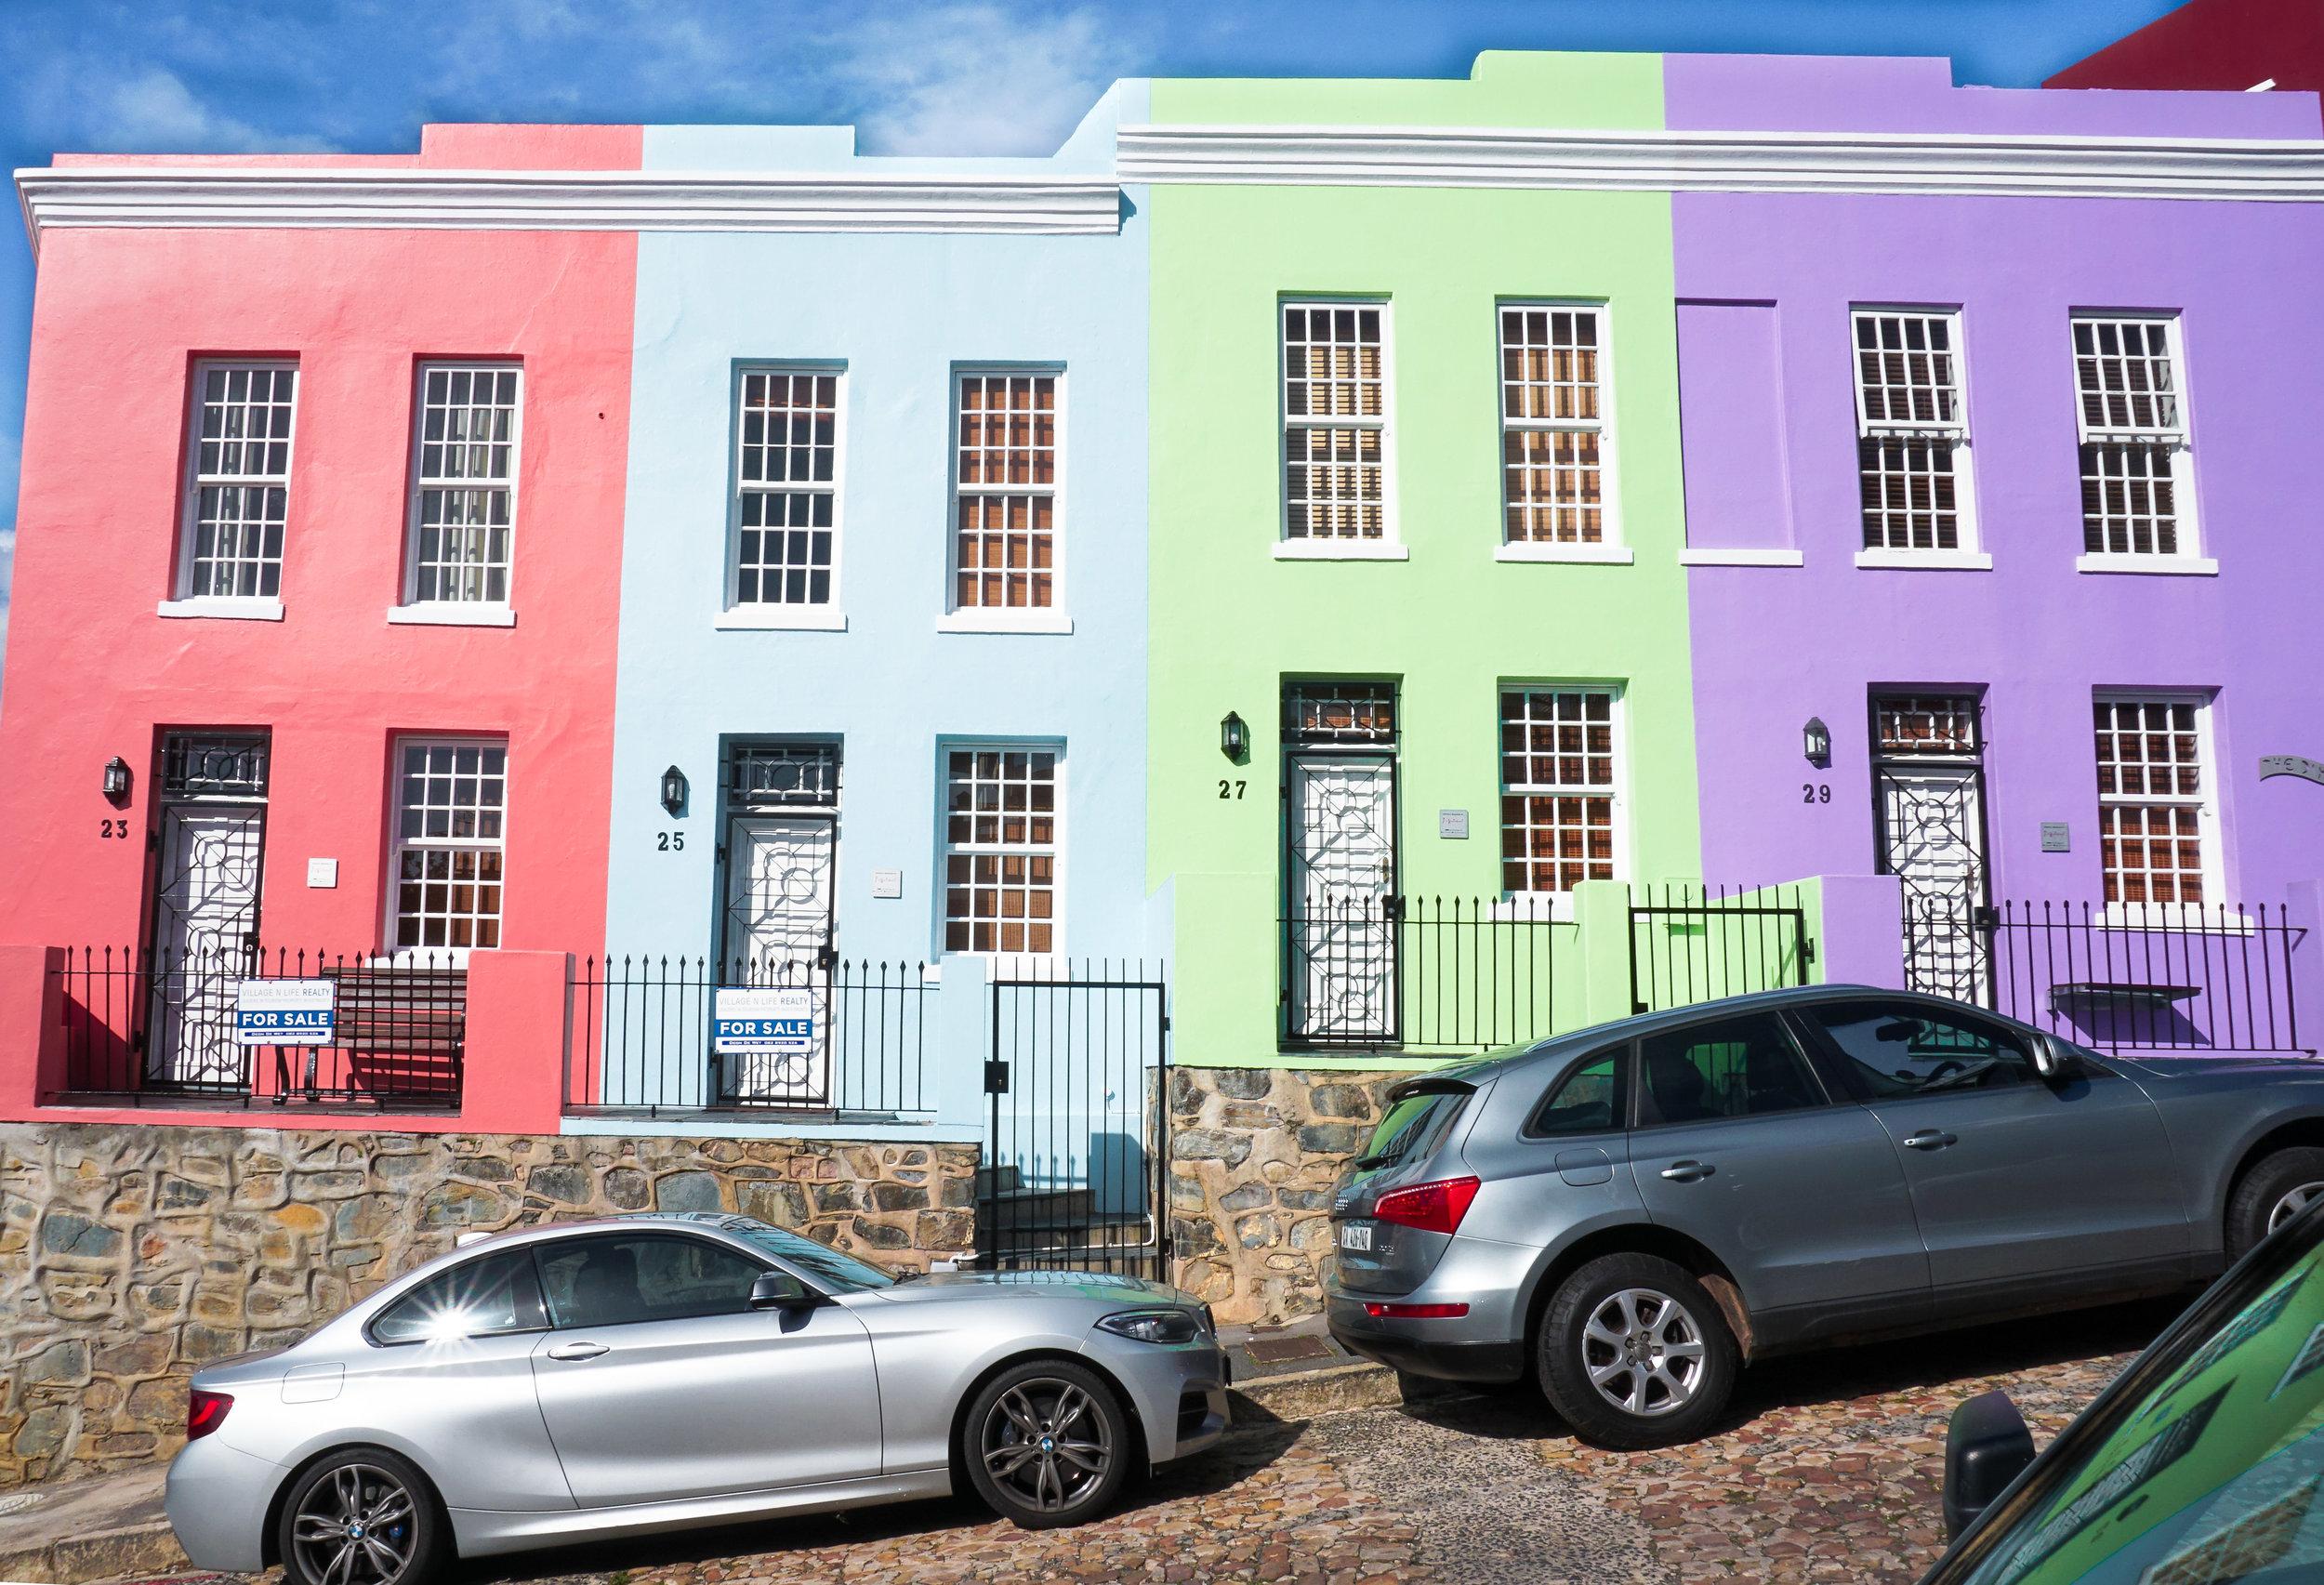 curio.trips.south.africa.cape.town.bo.kaap.colourful.row.houses.landscape-2.jpg